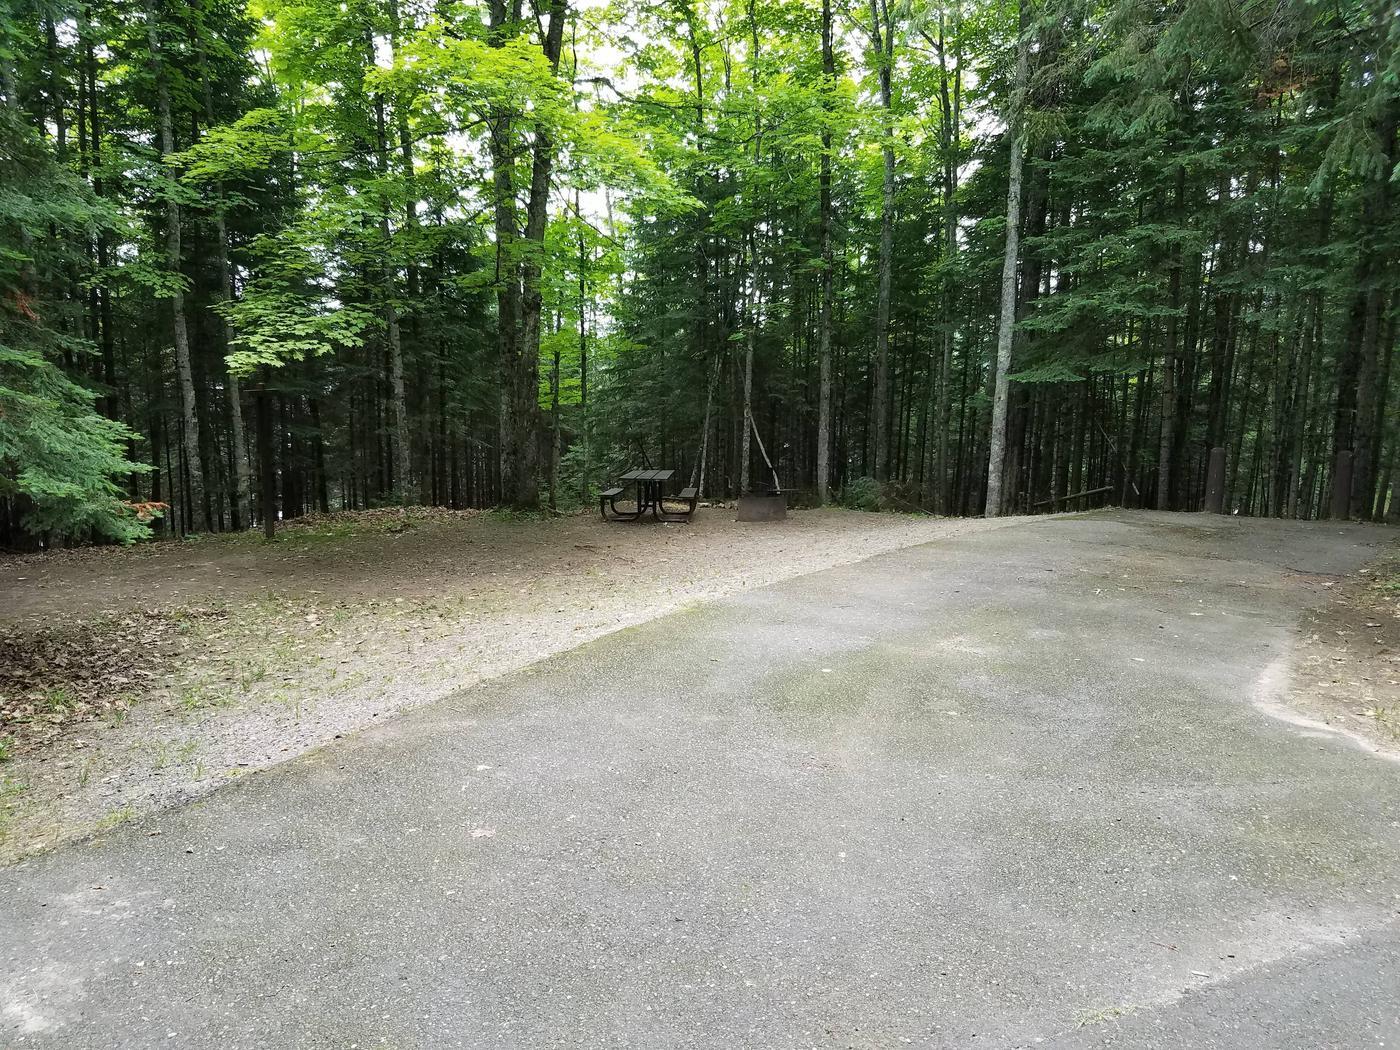 View of Lake Ottawa Campground campsite 18View of Lake Ottawa Campground campsite 18.